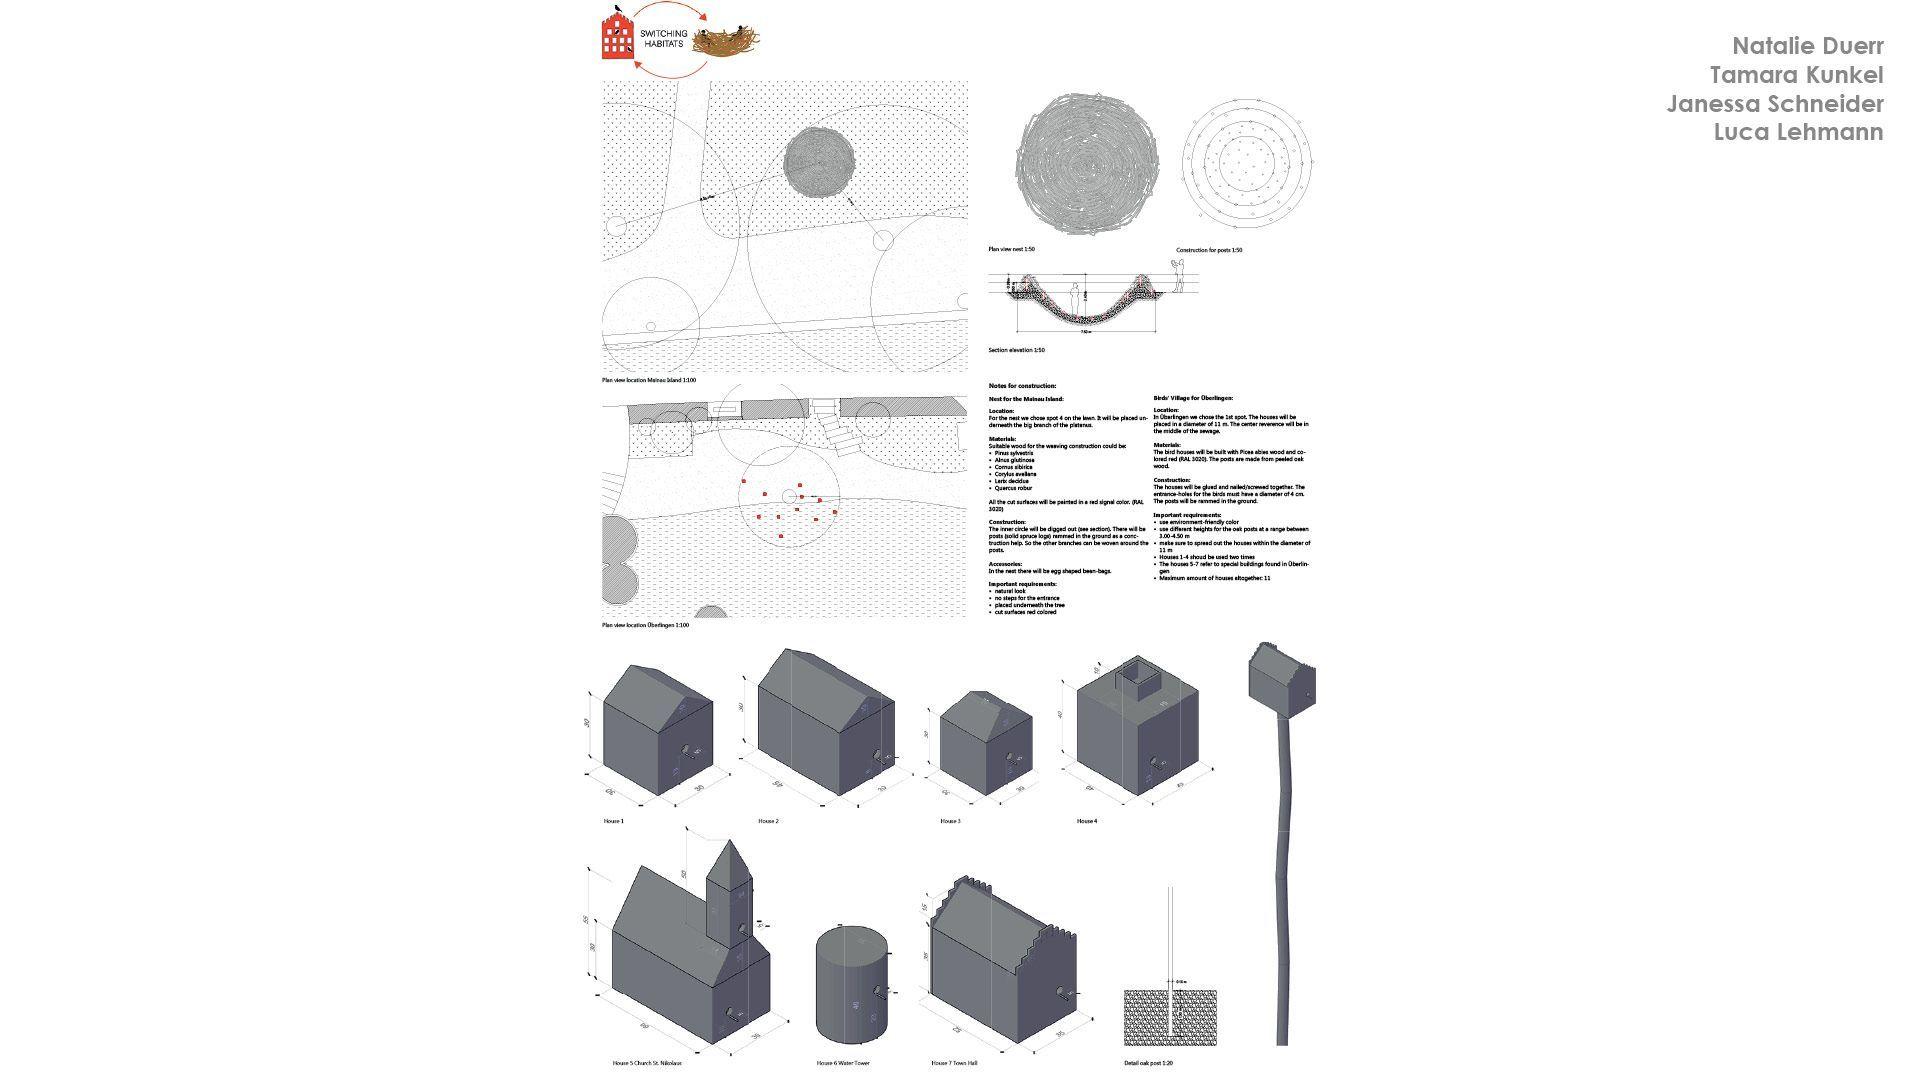 14 2019 8 Integrierte Planung